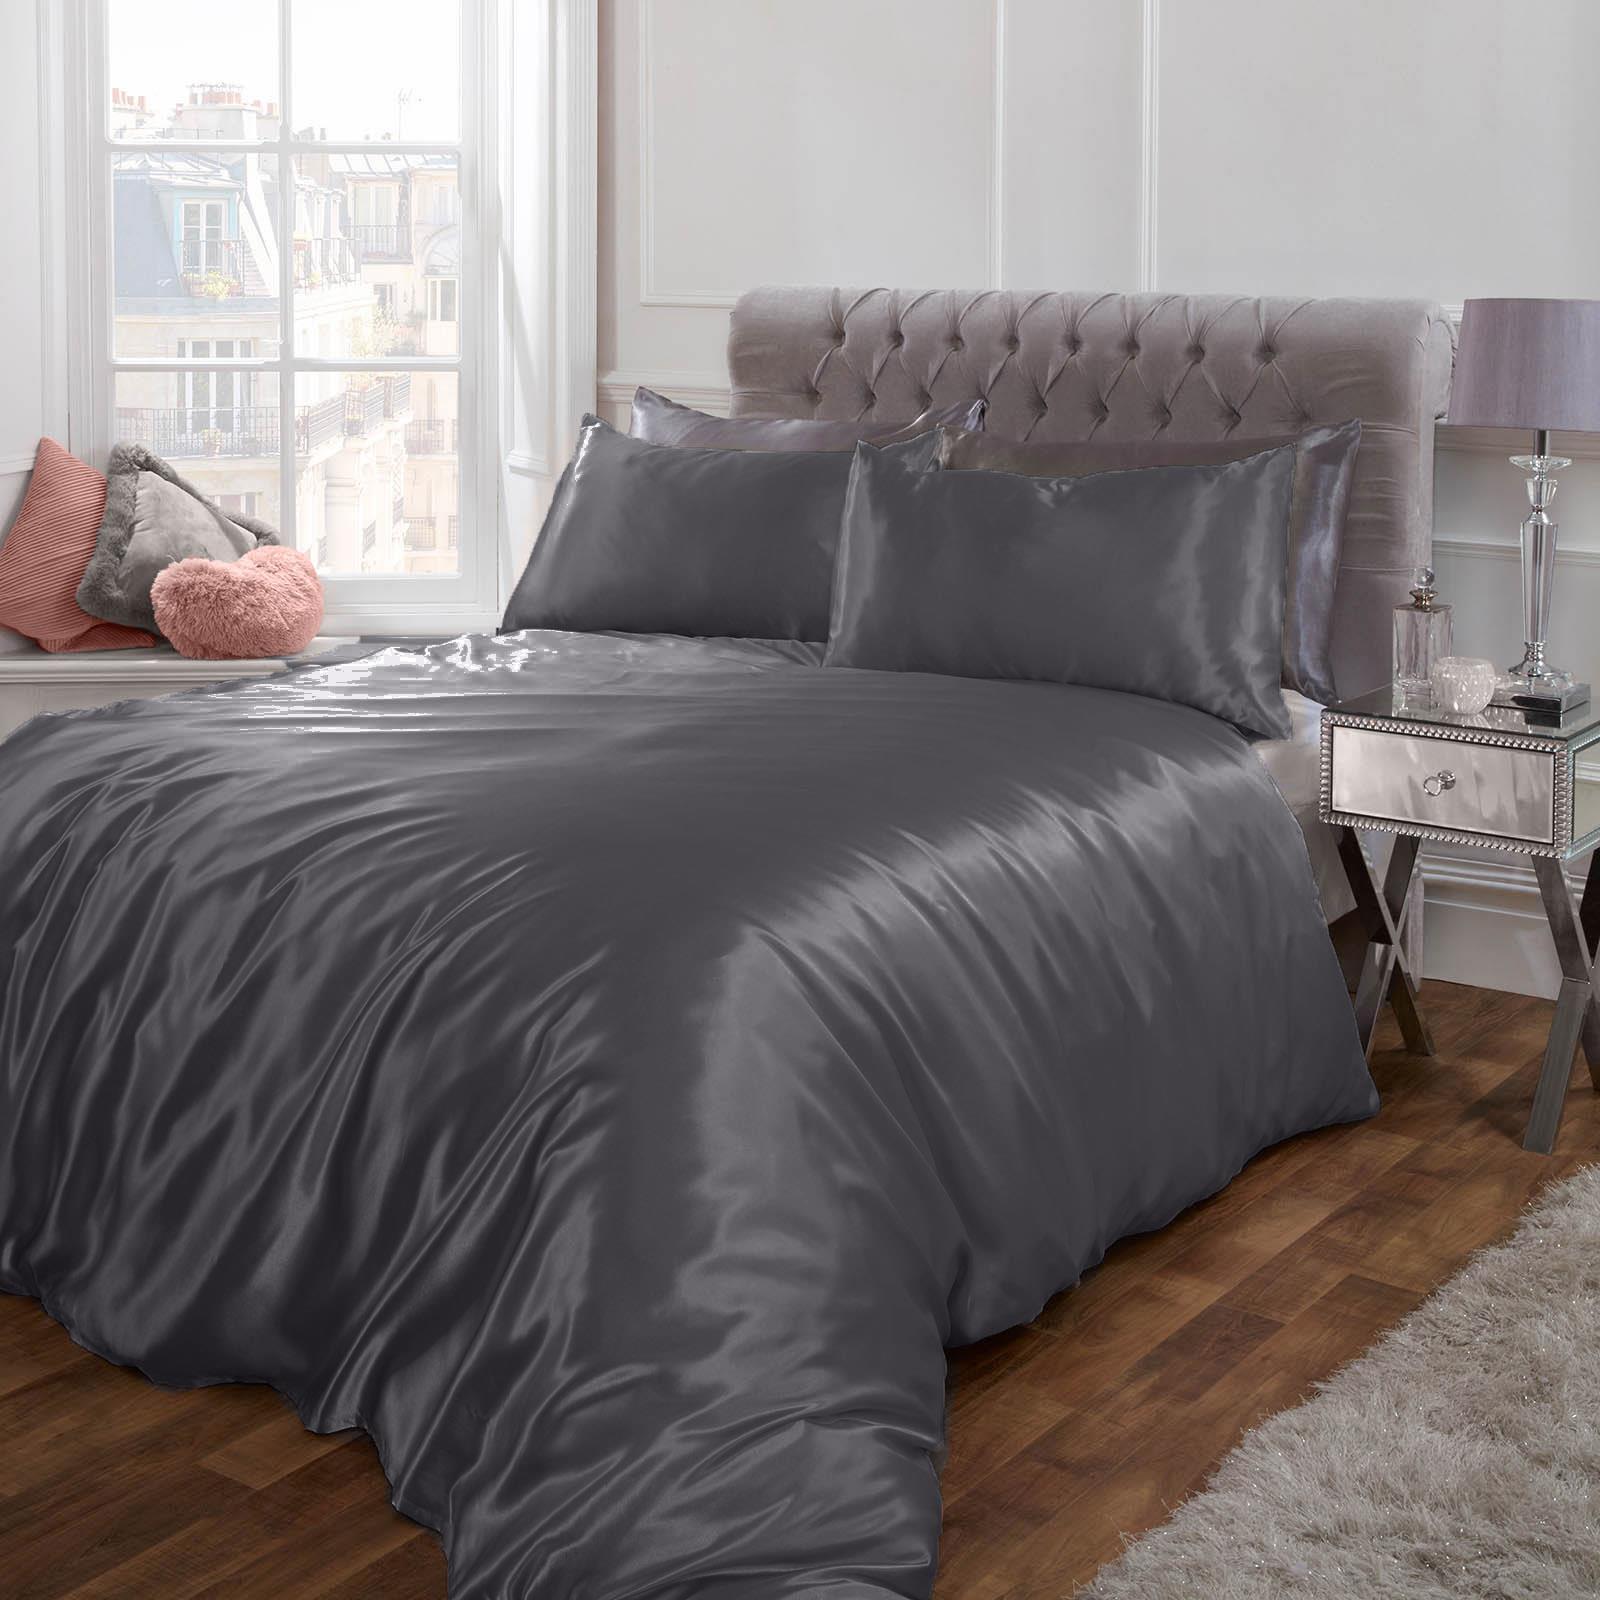 thumbnail 9 - Sienna Satin Silk Duvet Cover with Pillowcases Bedding Set, Blush Pink Silver